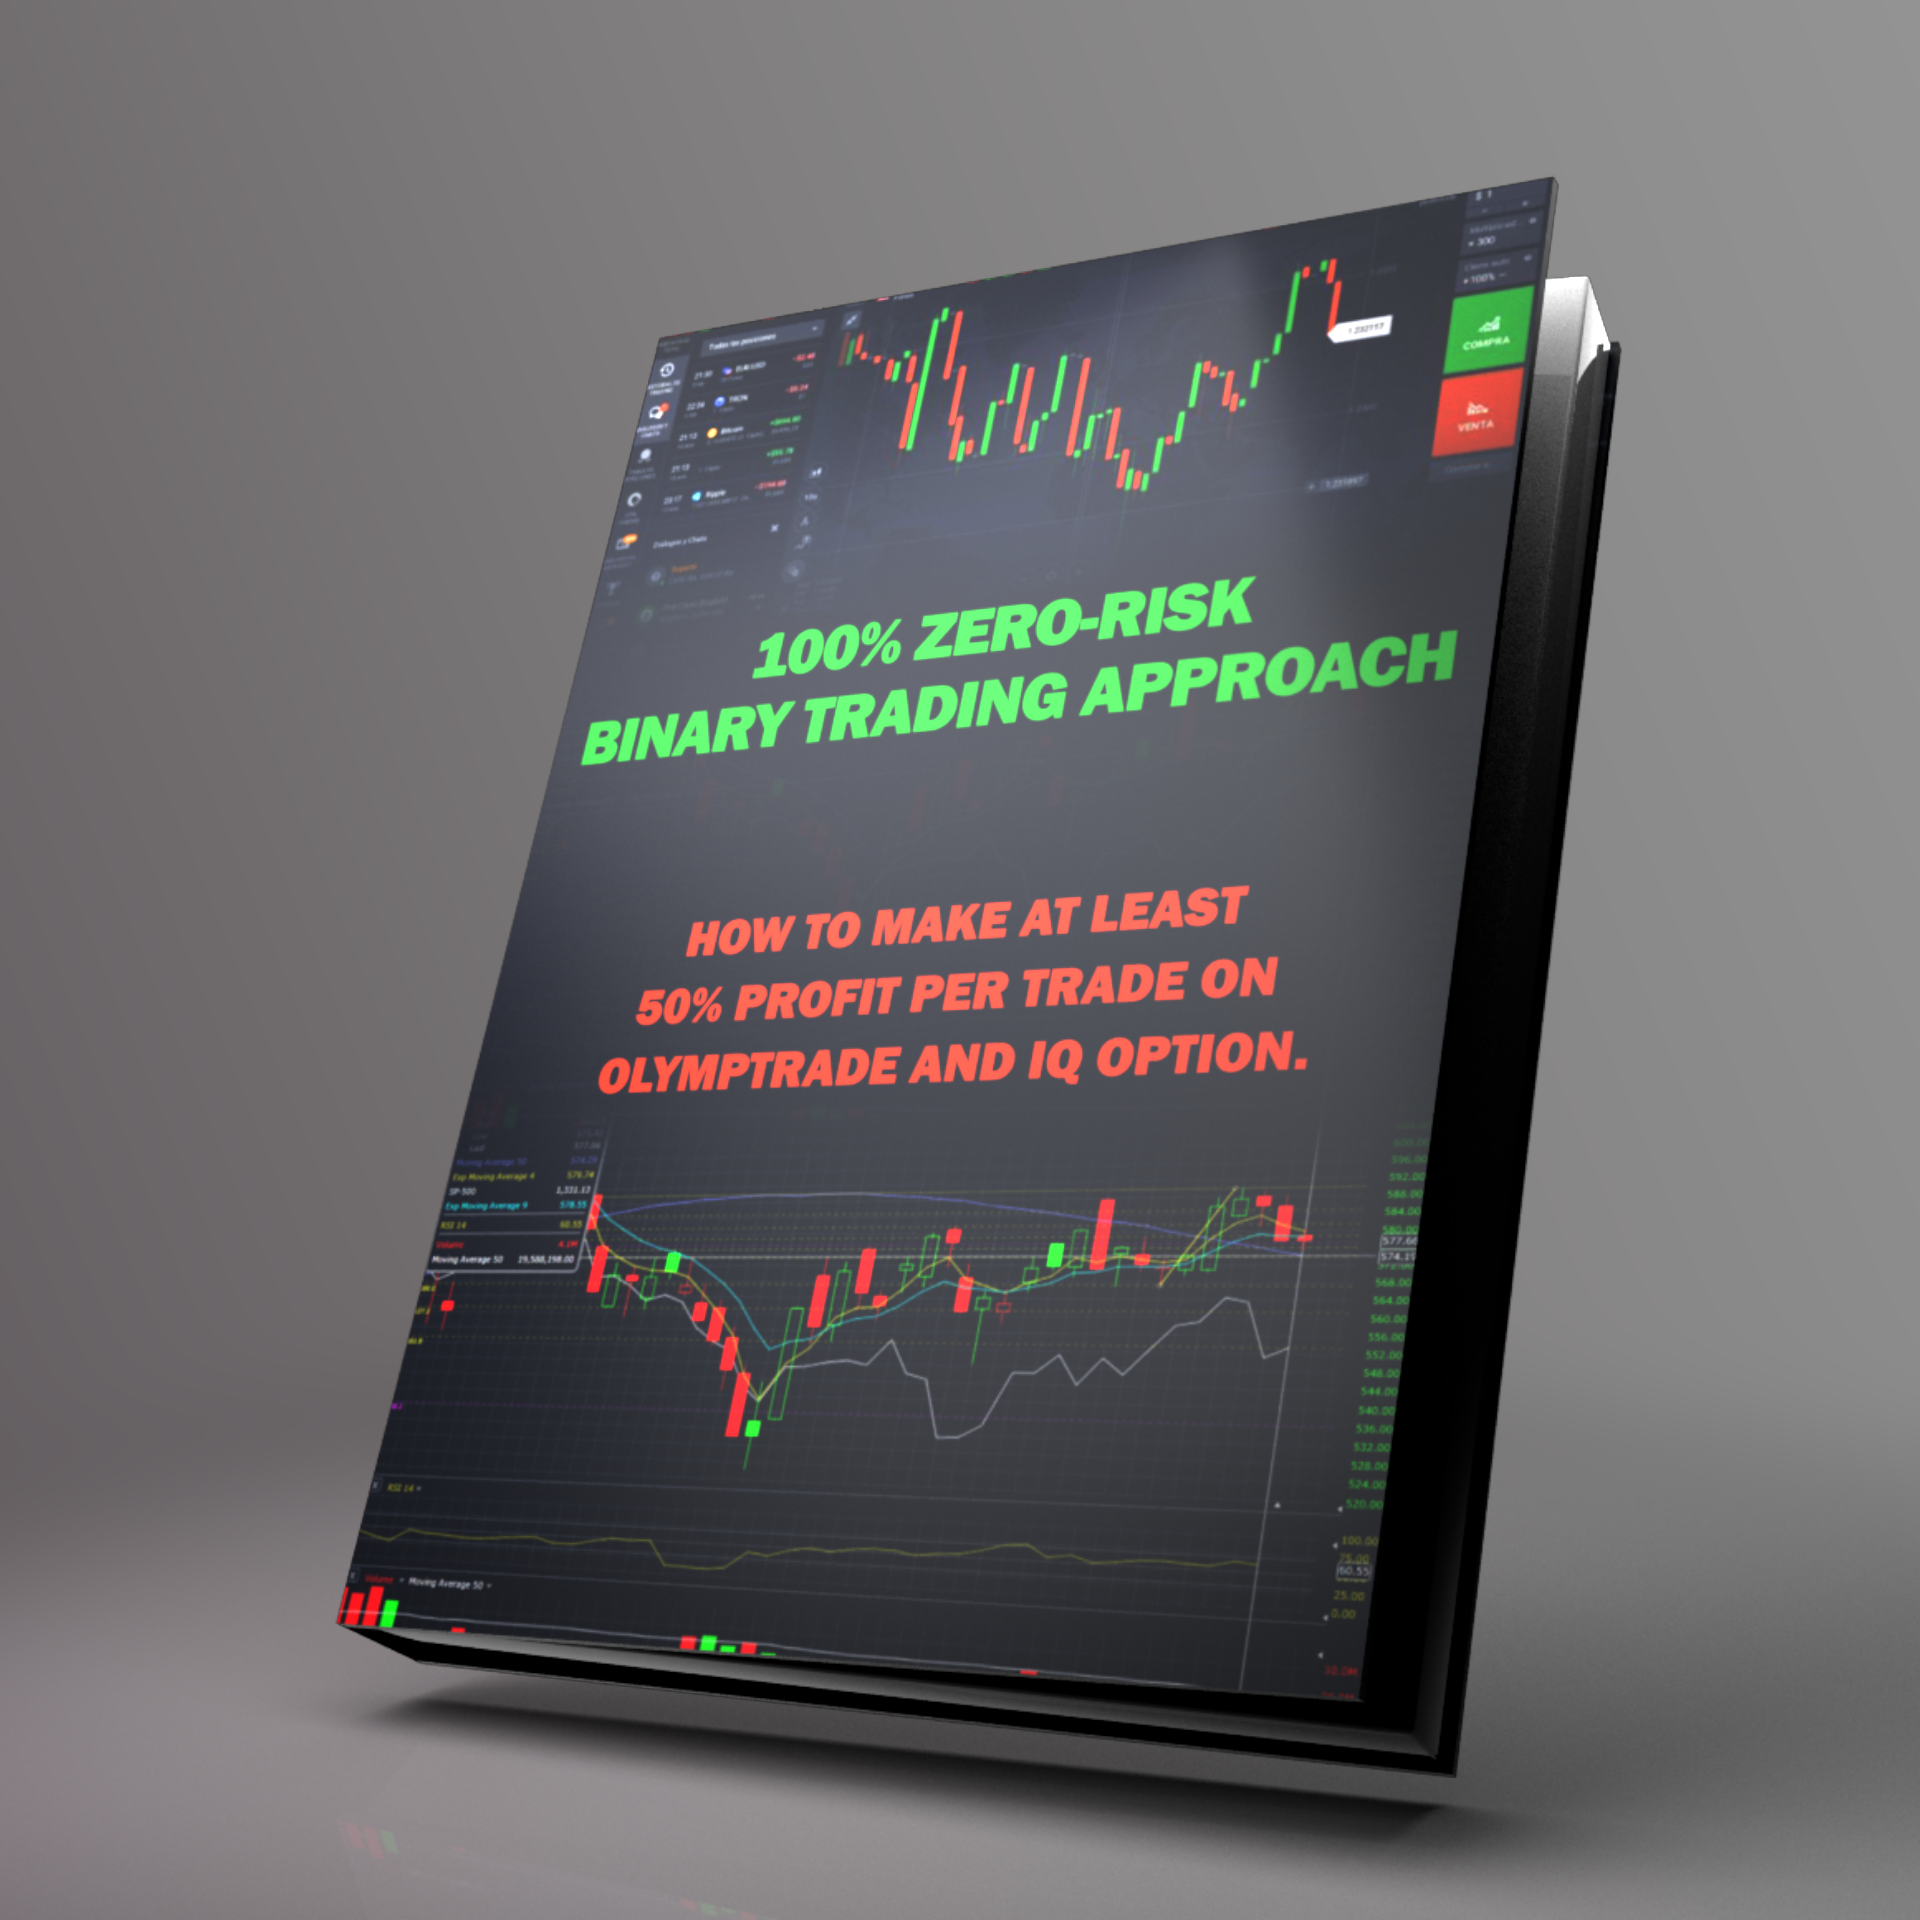 Binary options zero risk strategy binary options trading strategy 2021 calendar